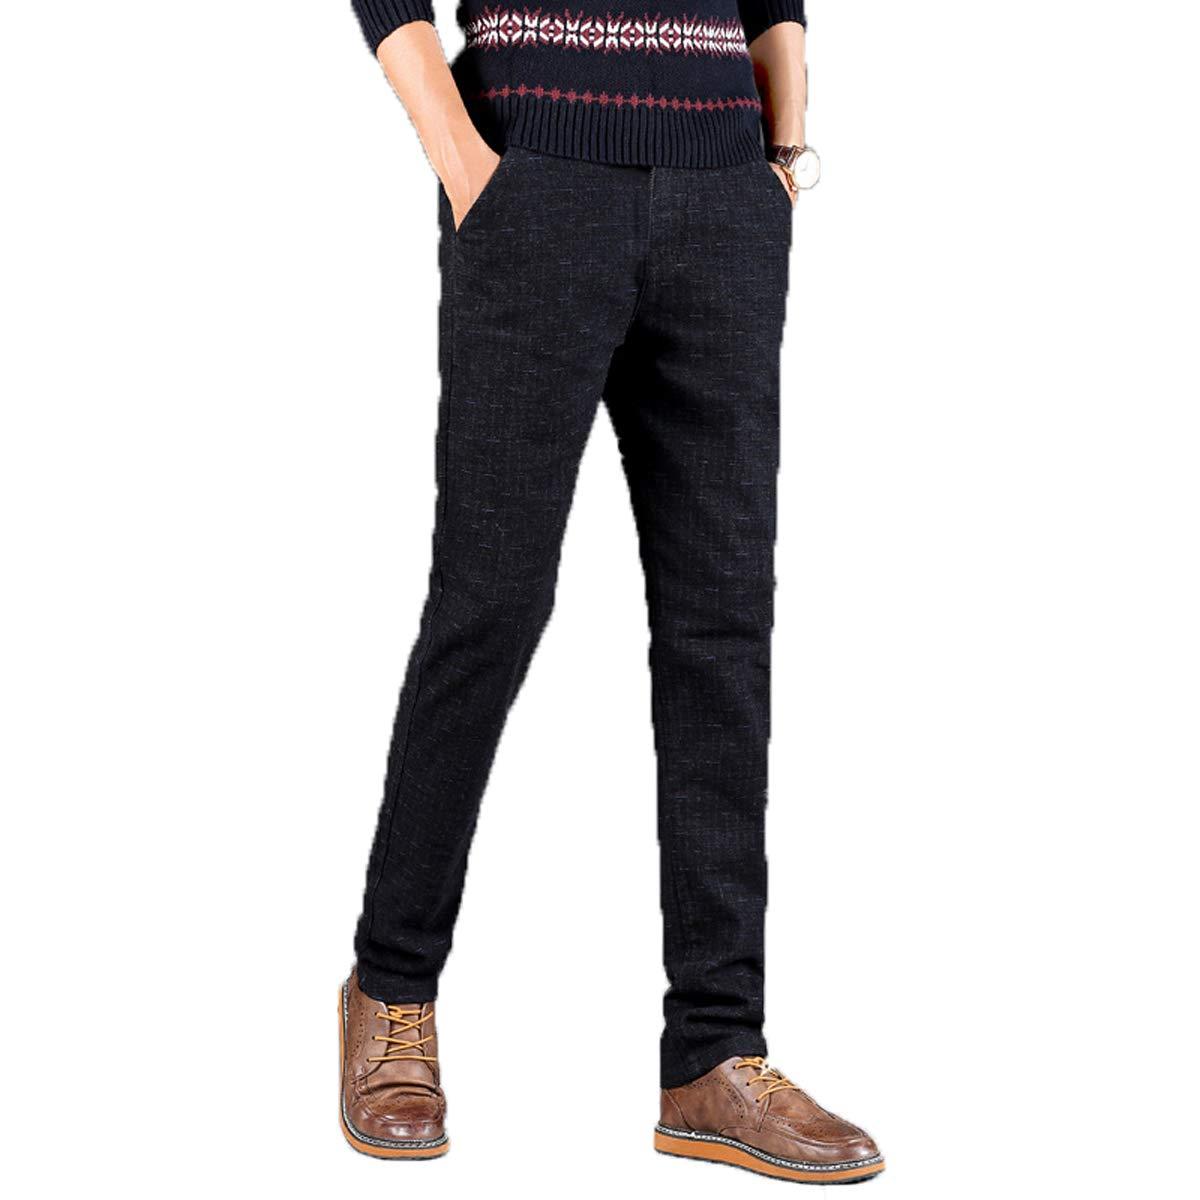 Men's Slim-Fit Wrinkle-Resistant Flat-Front Pant Casual Straight Trousers Fmeijia Black